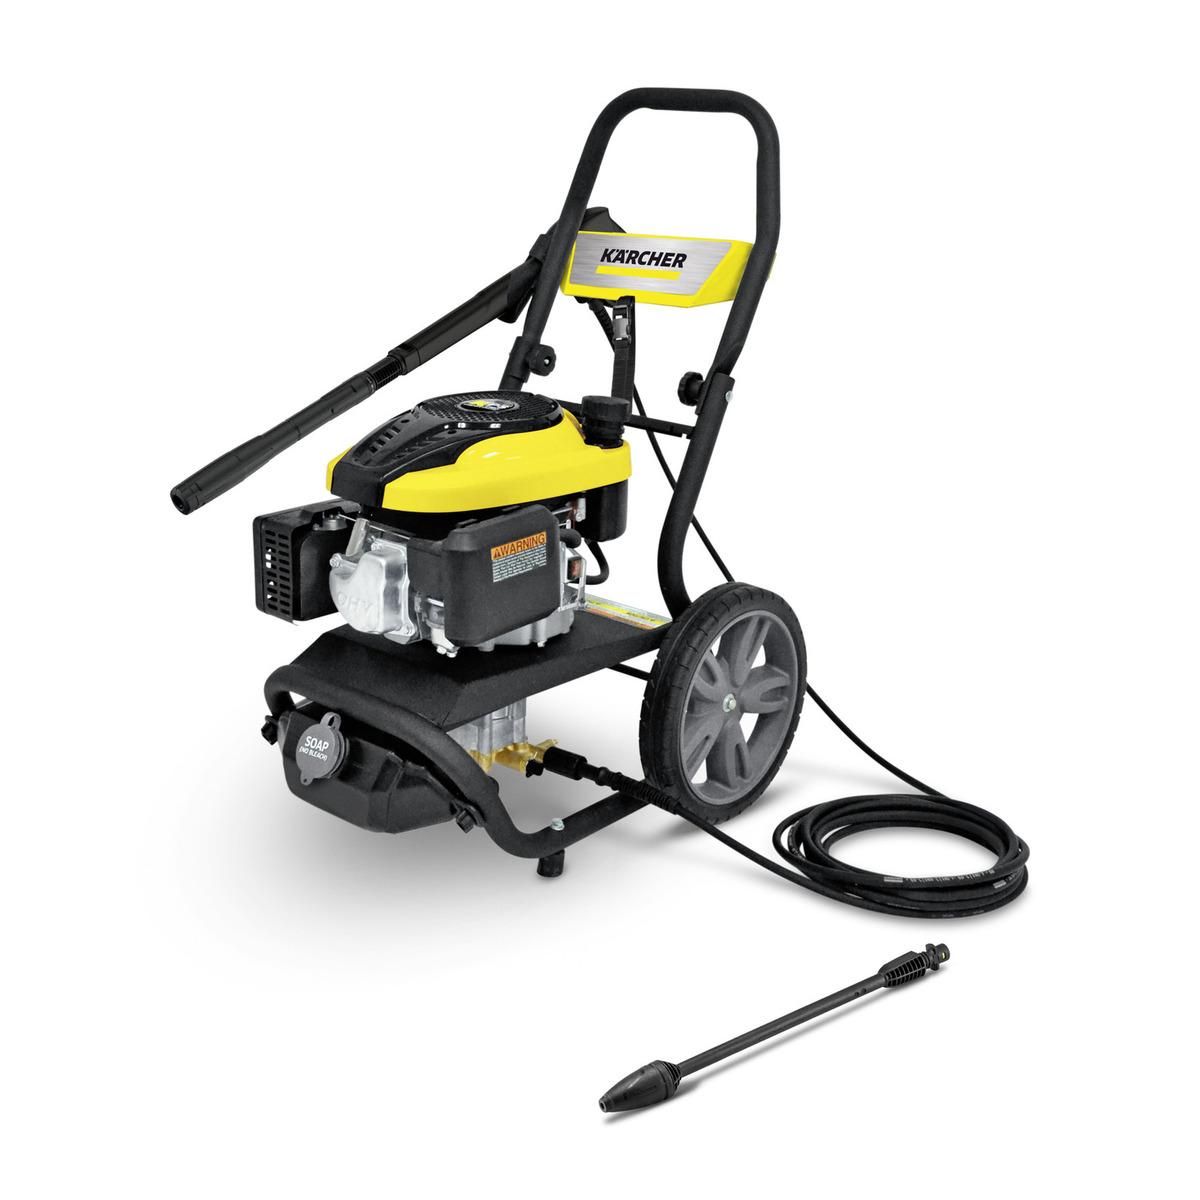 Karcher-mašina-za-pranje-pod-visokimo-pritiskom-na-benzinski-ppogon-G7.180